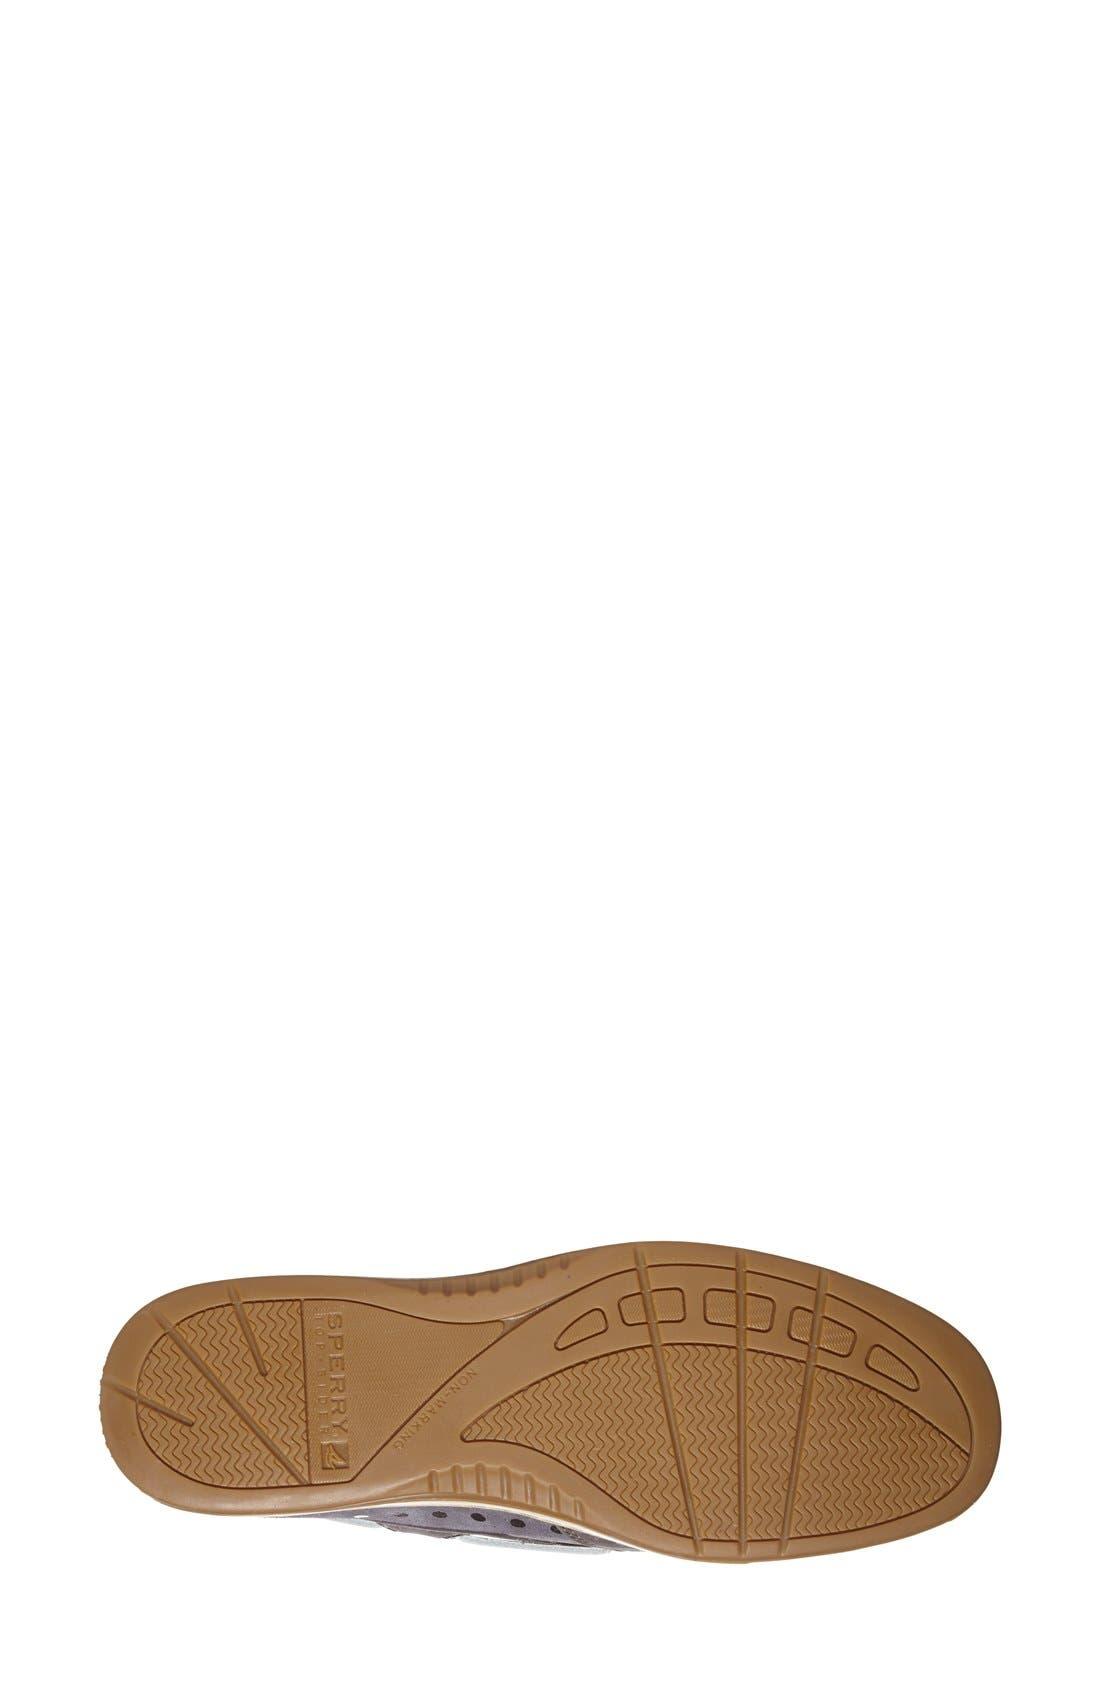 Alternate Image 4  - Sperry Top-Sider® 'Bluefish' Boat Shoe (Women)